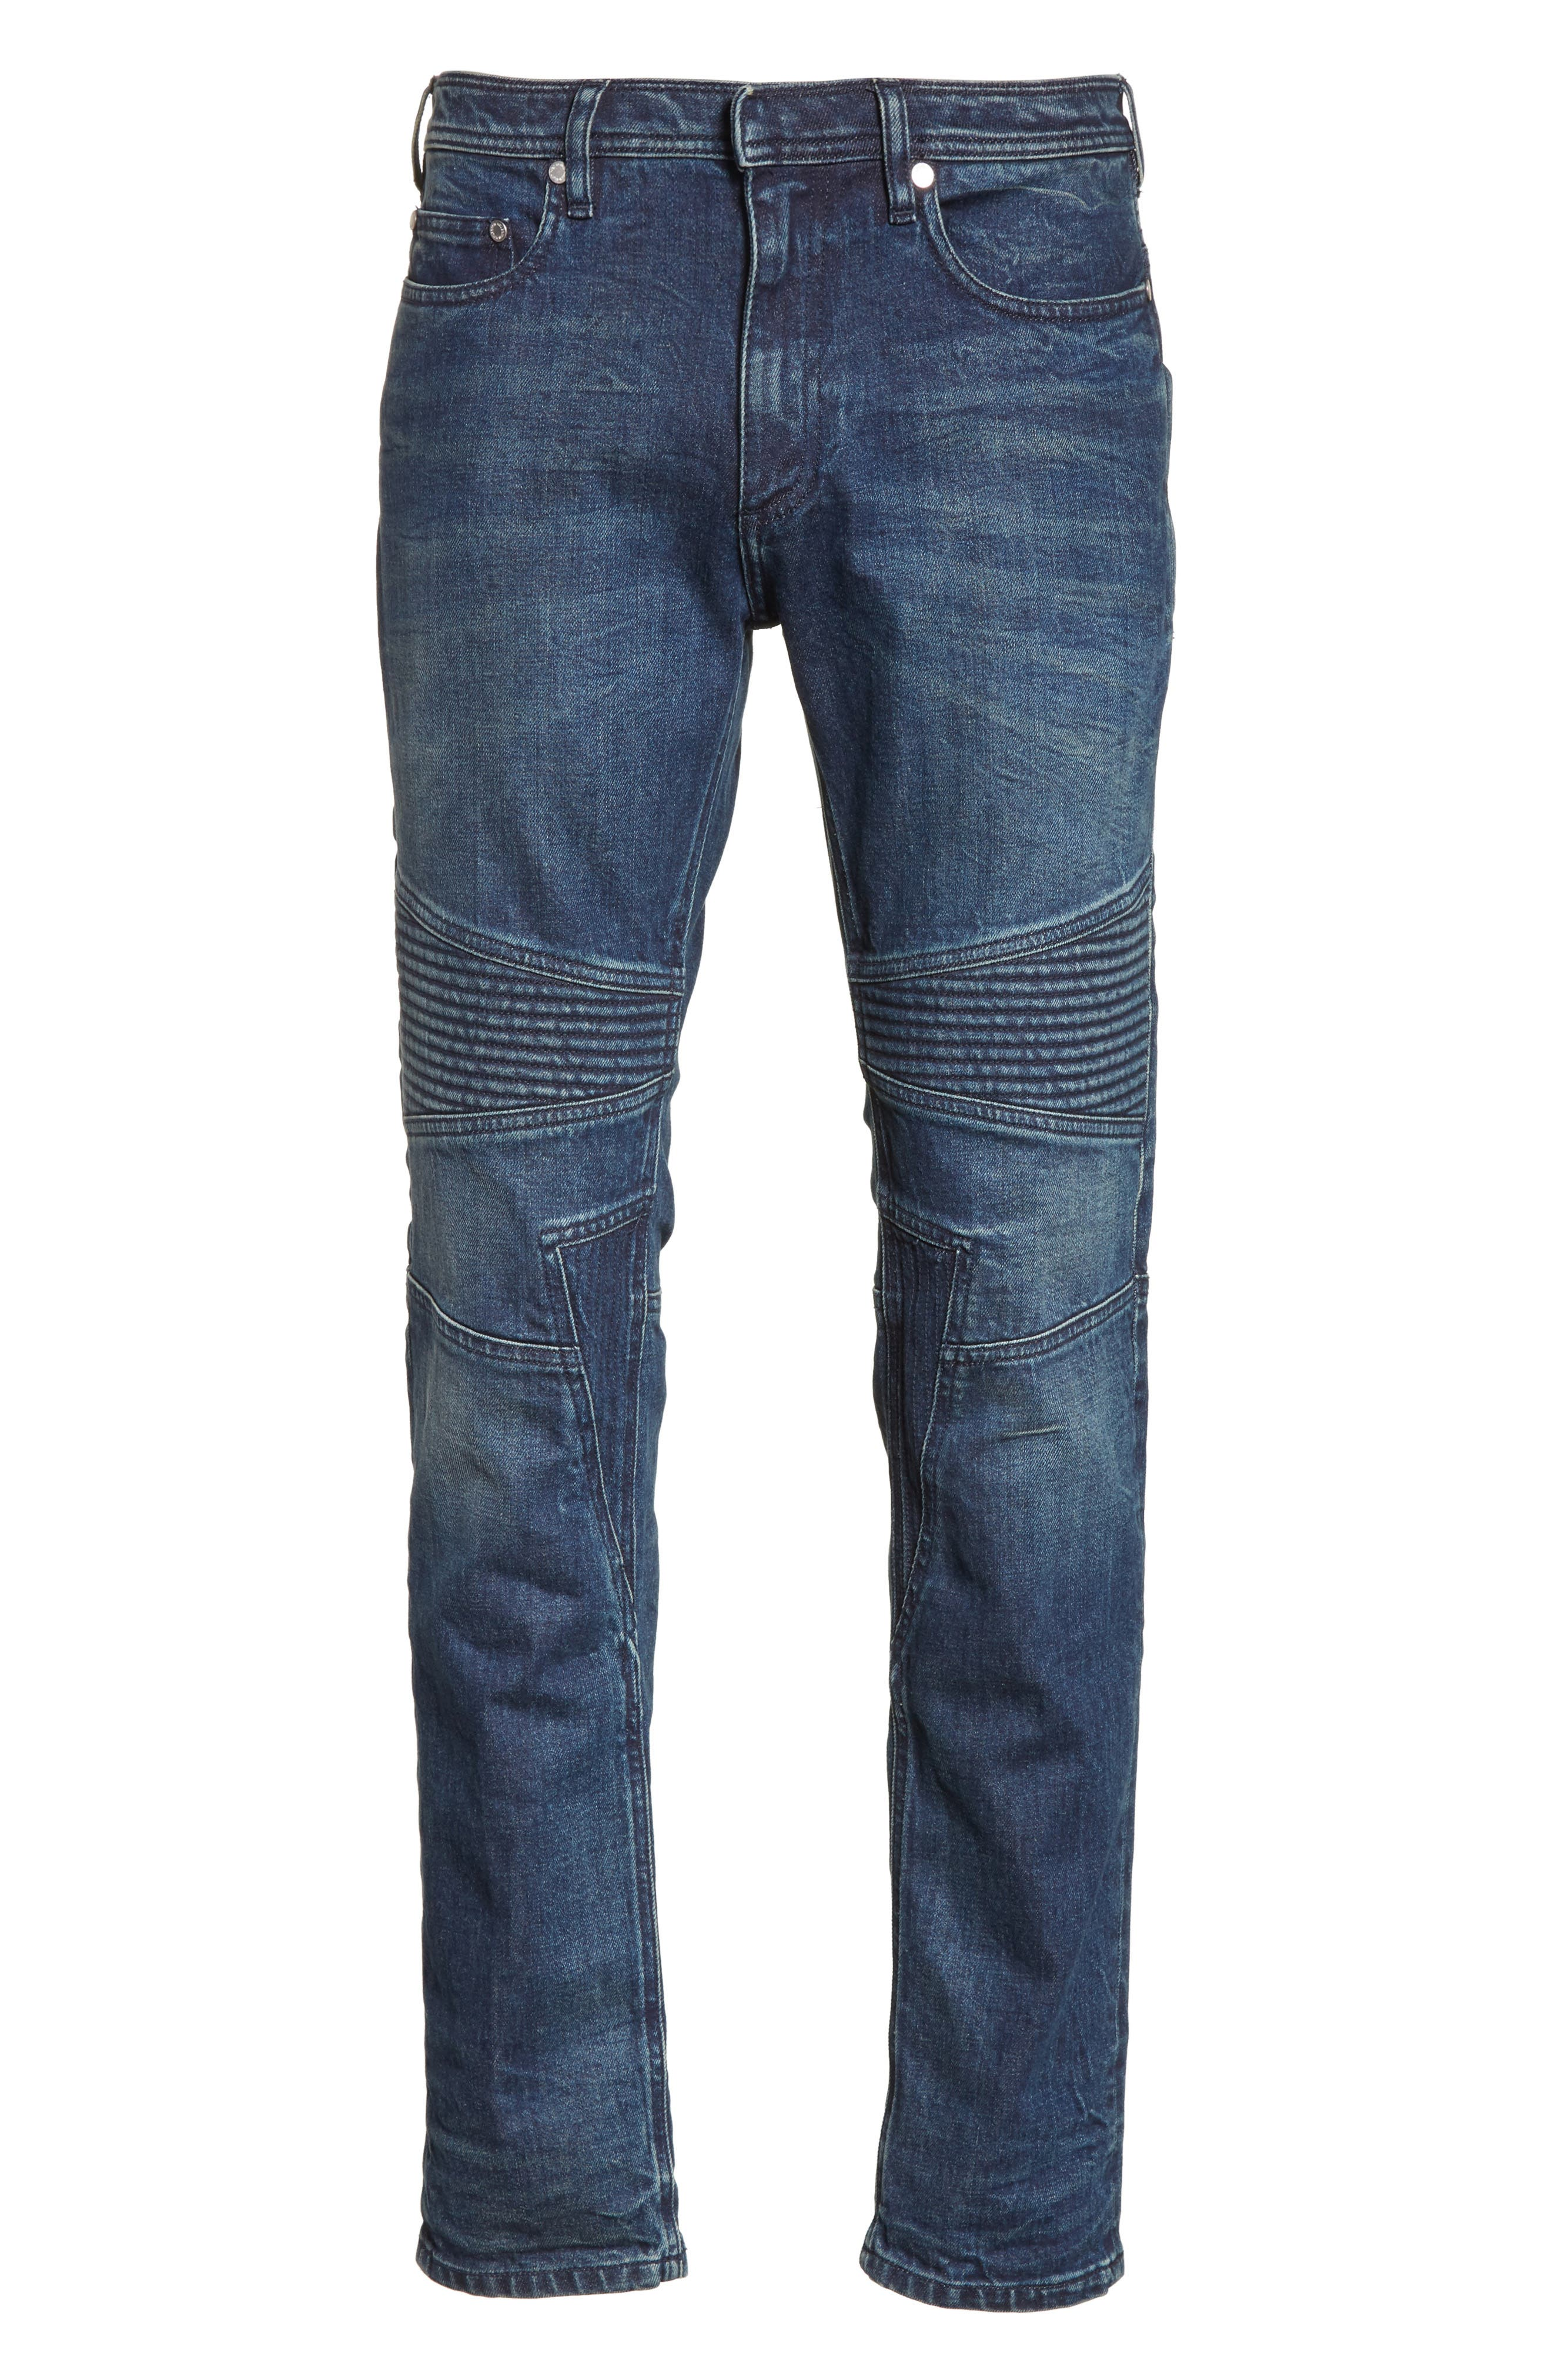 Moto Jeans,                             Alternate thumbnail 6, color,                             Indigo Blue